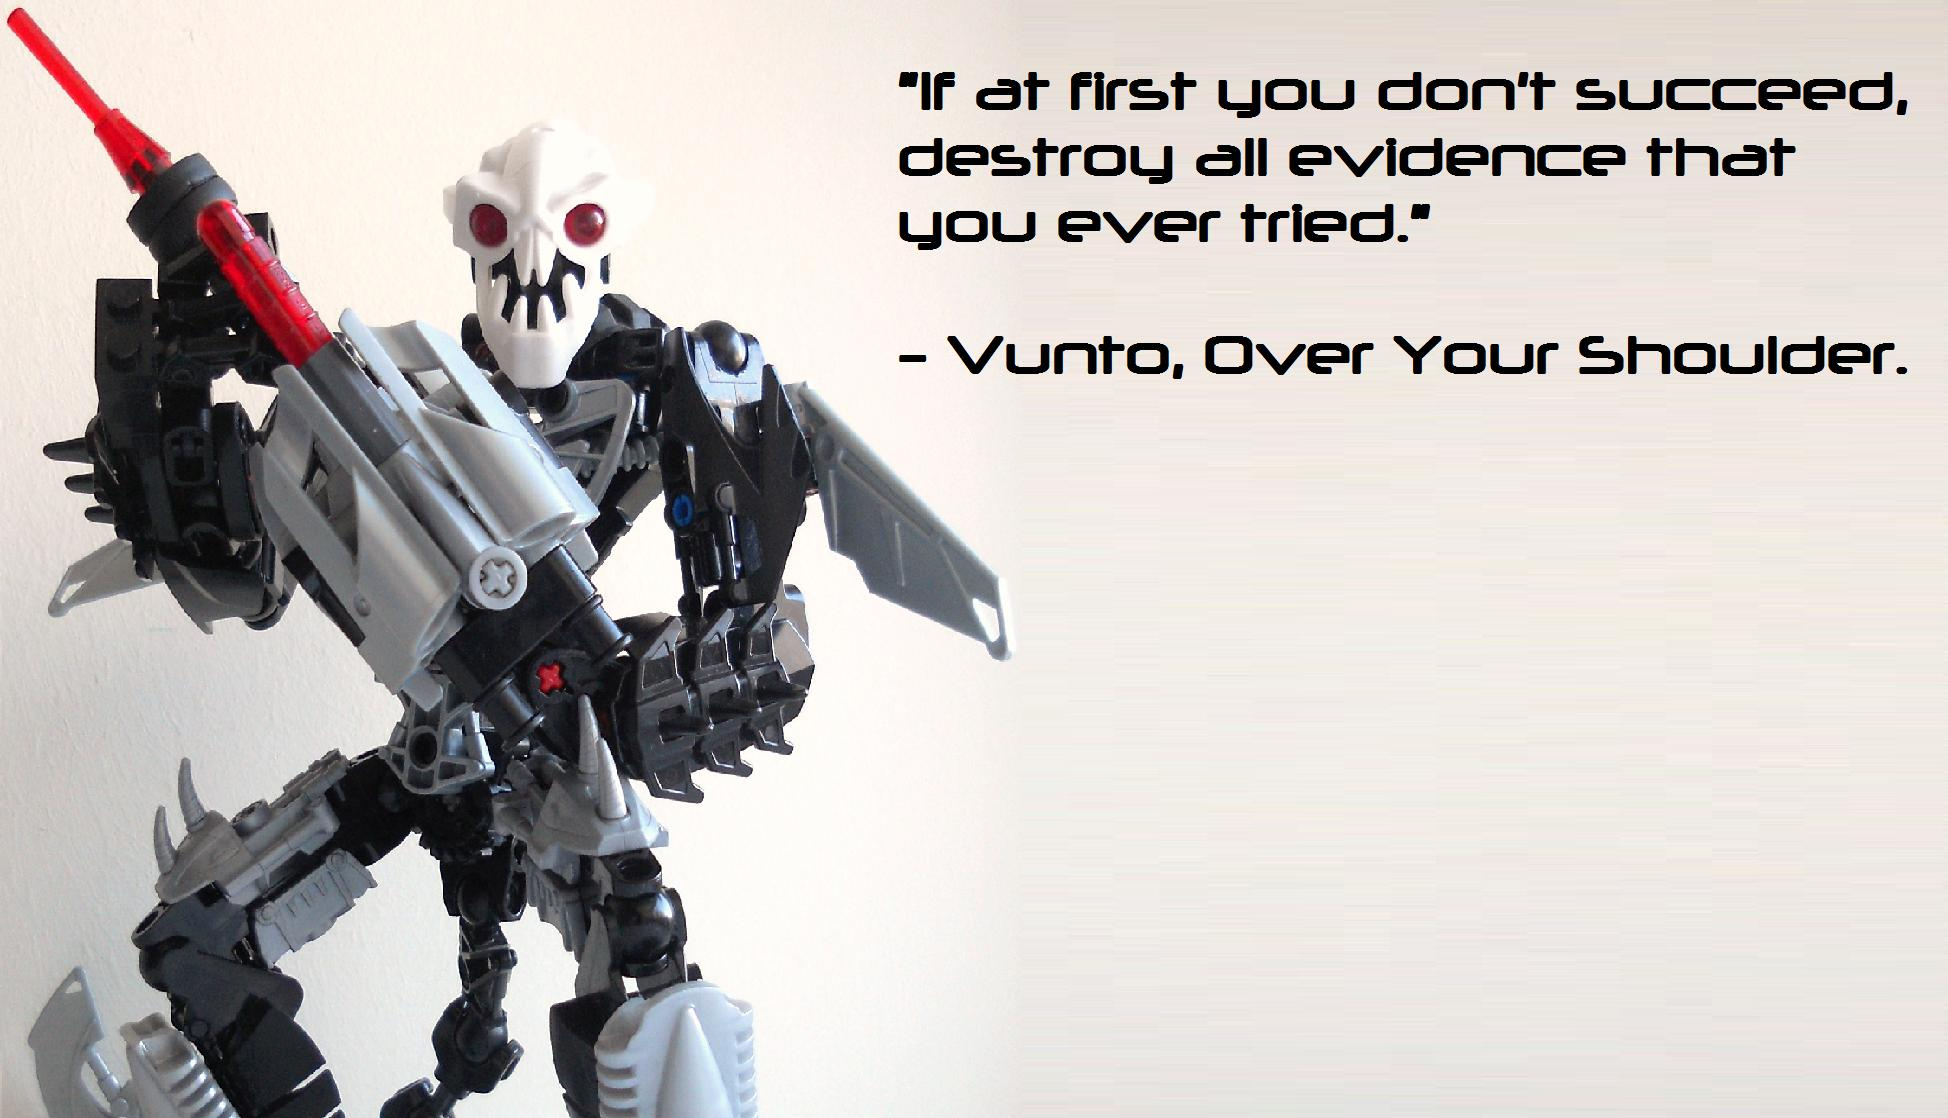 Promo quote #2